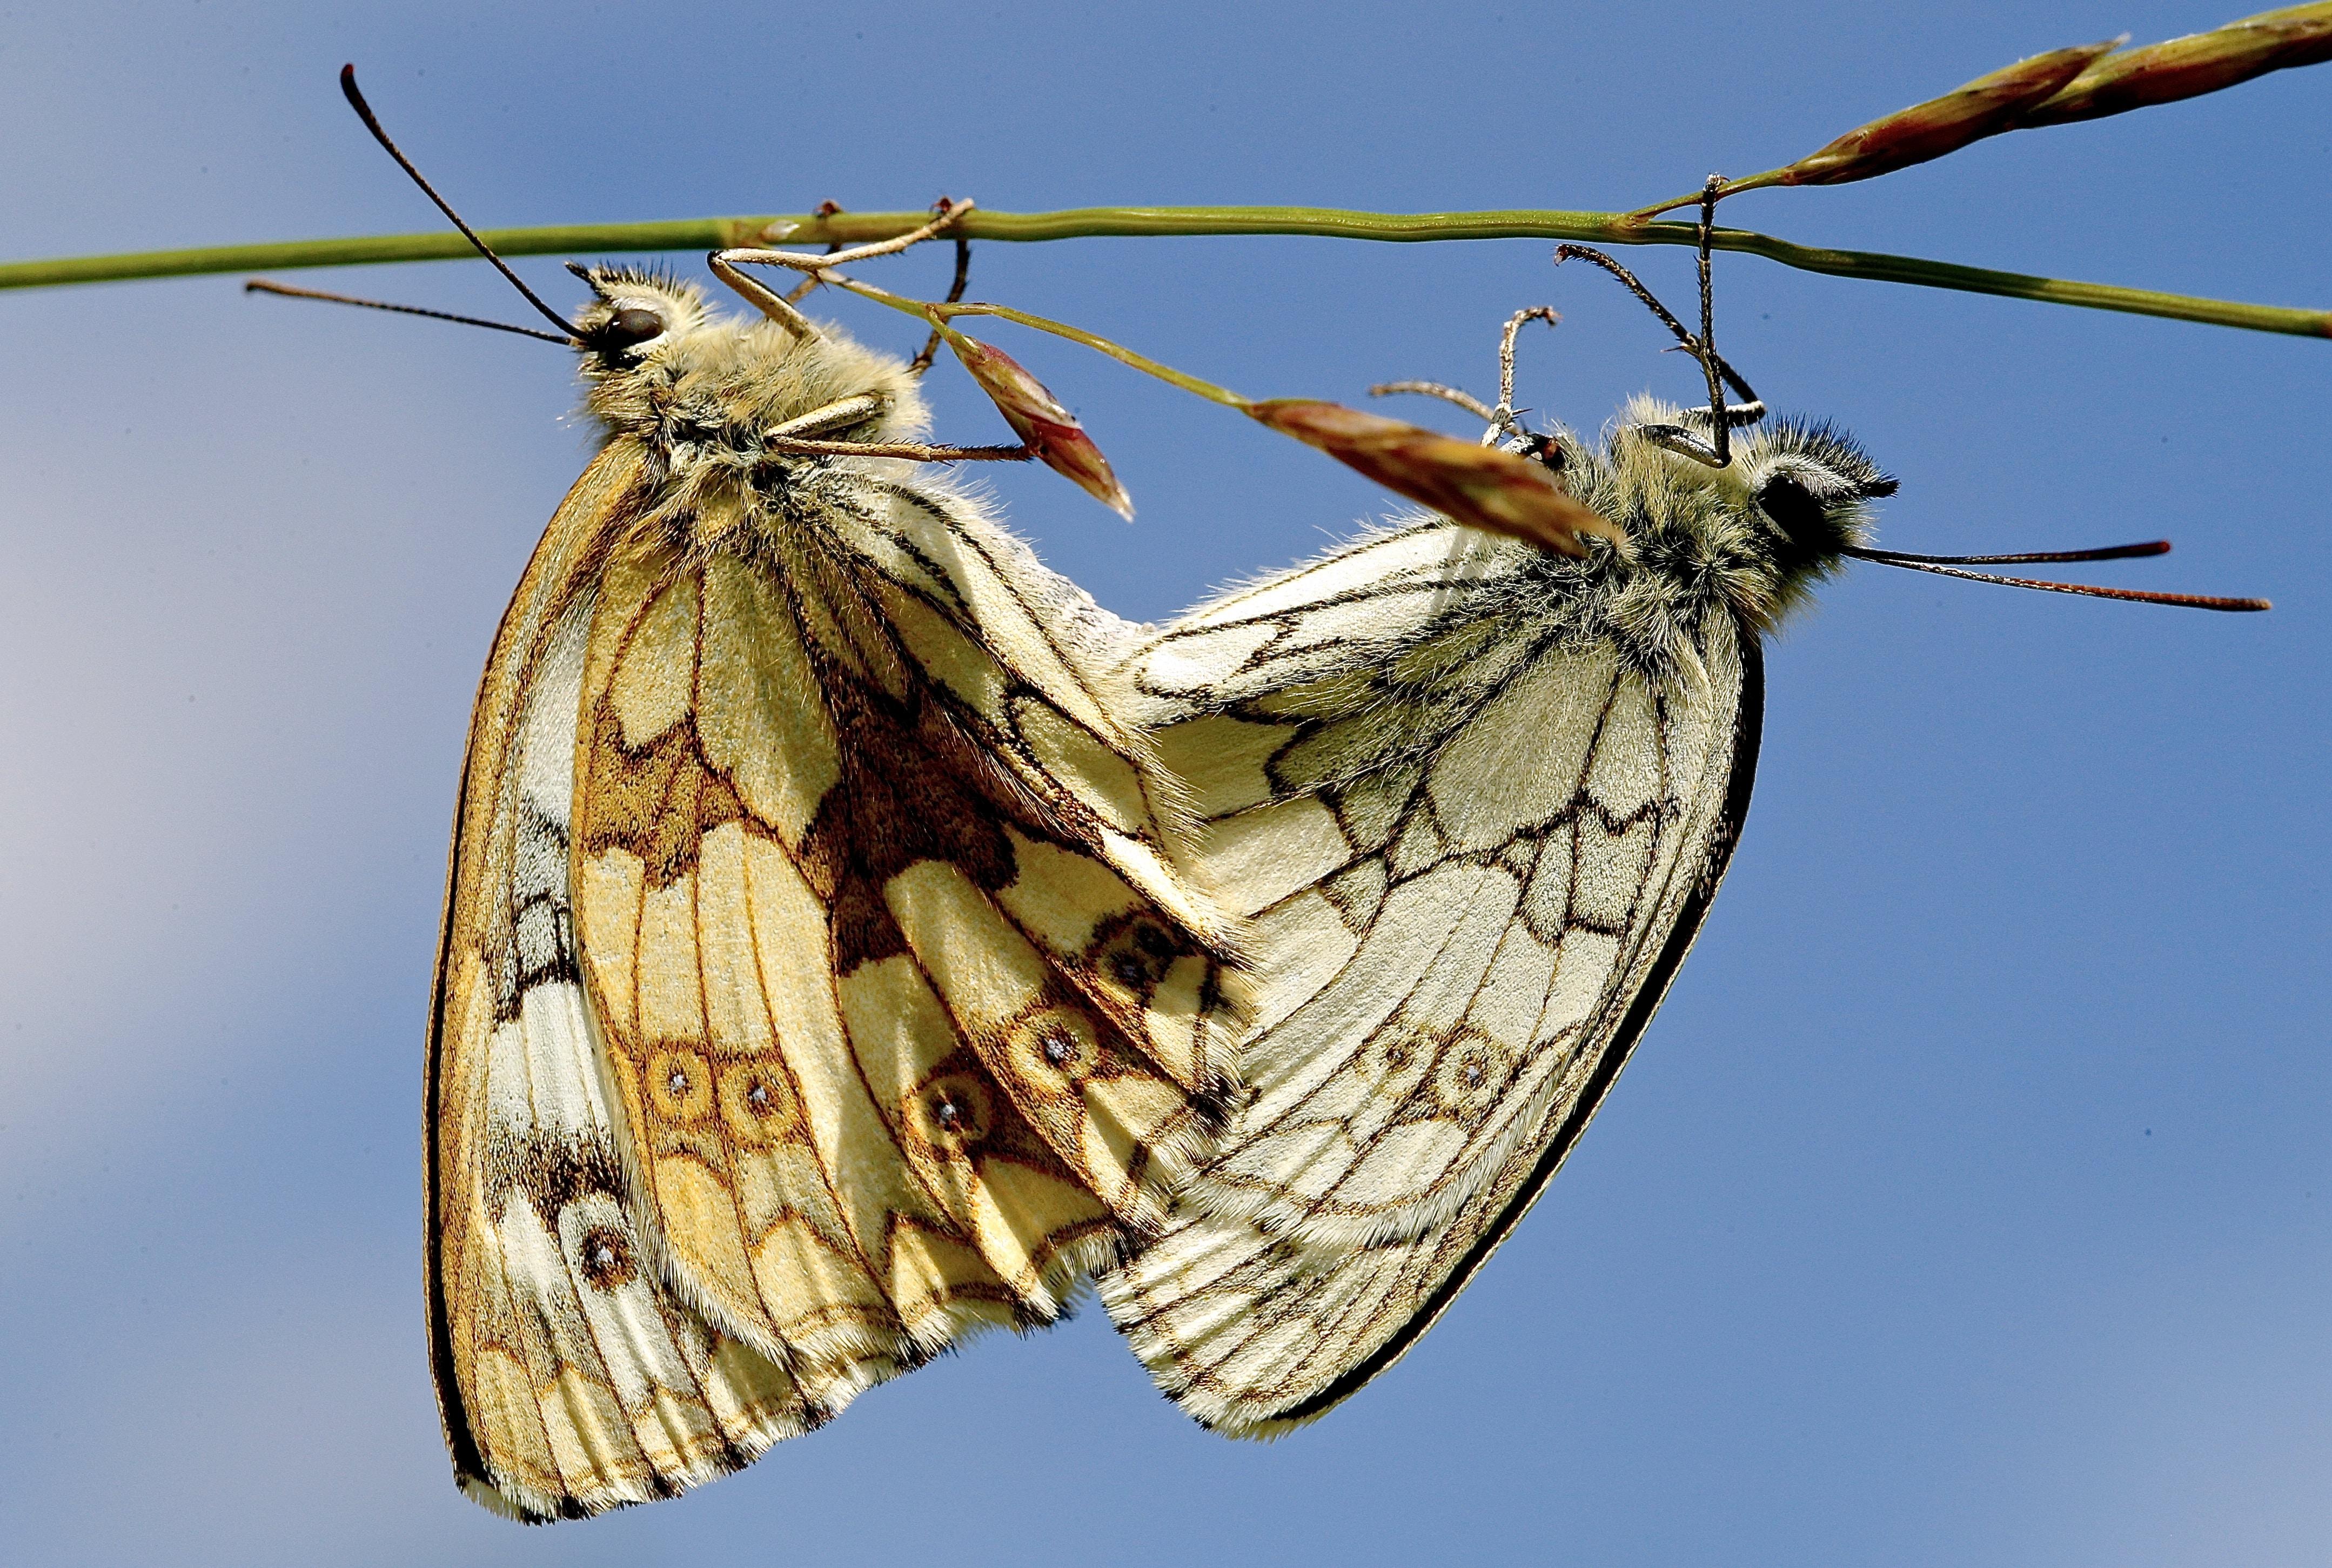 two brown butterflies